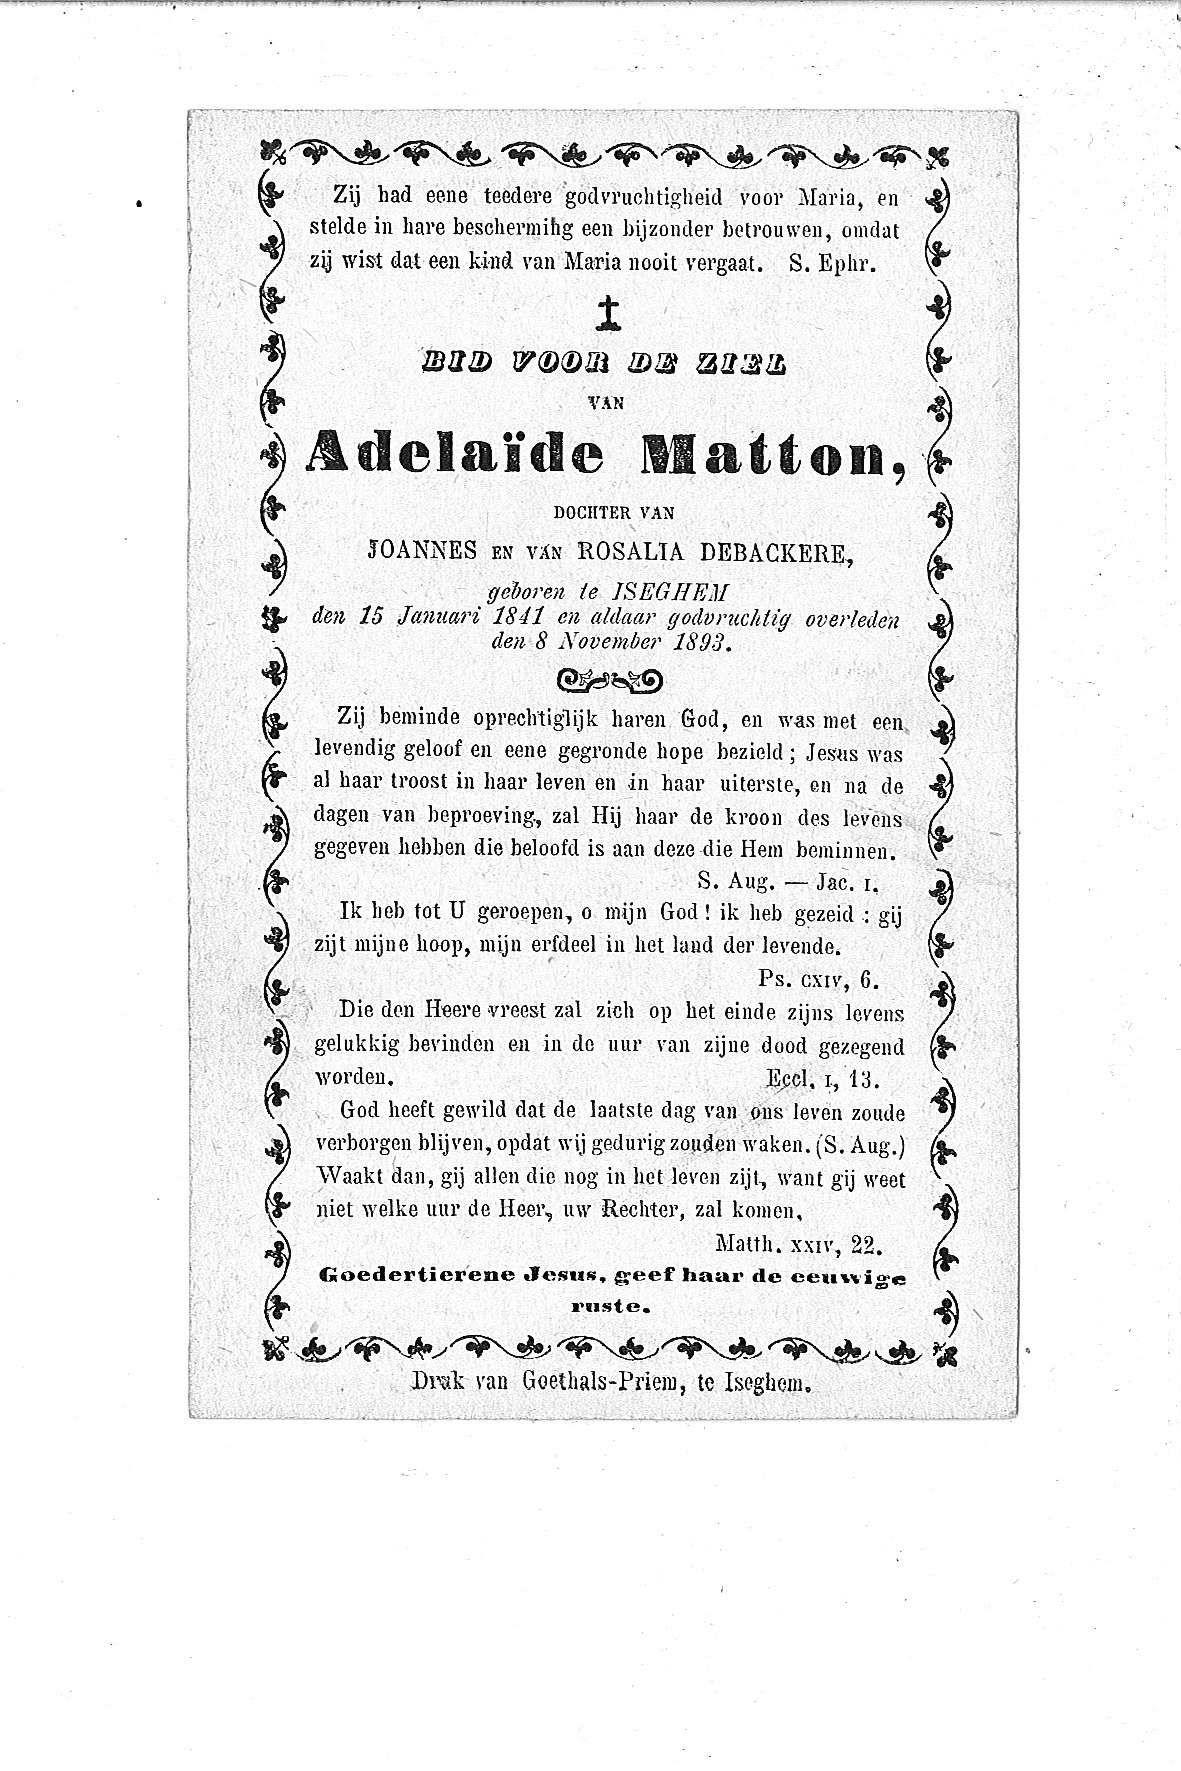 Adelaïde(1893)20100203092205_00001.jpg